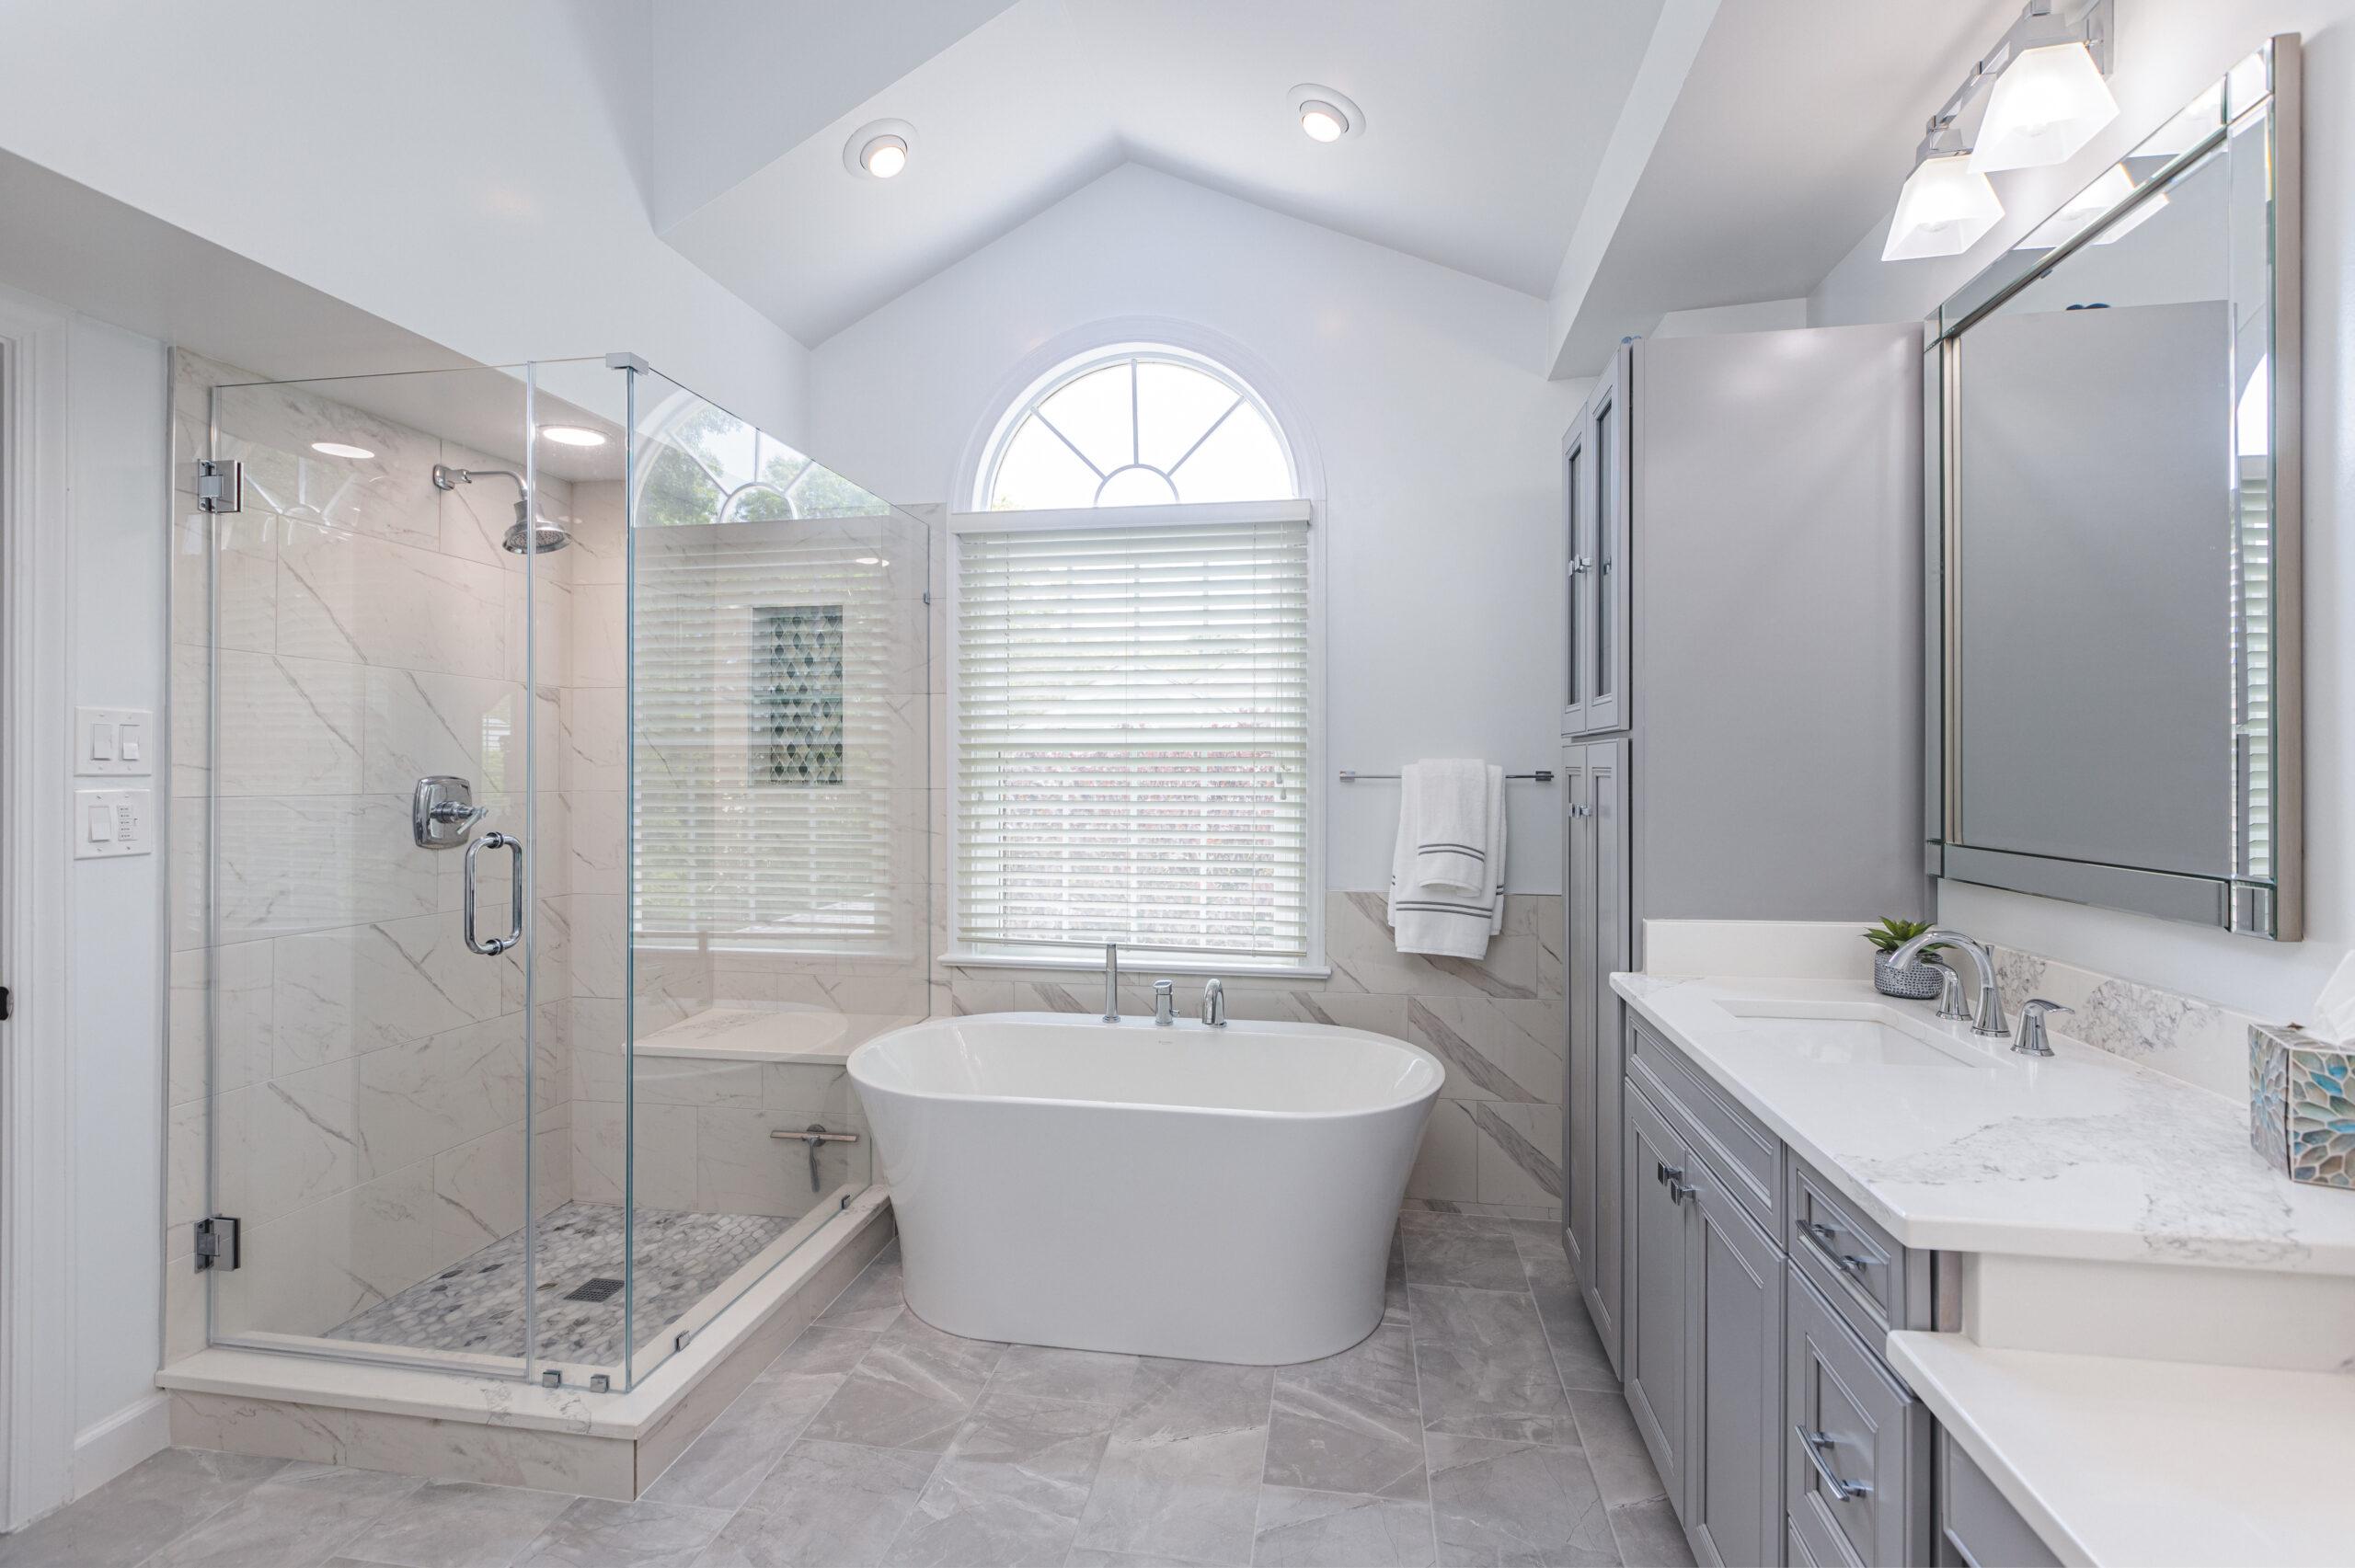 bathroom remodeling contractors Clifton